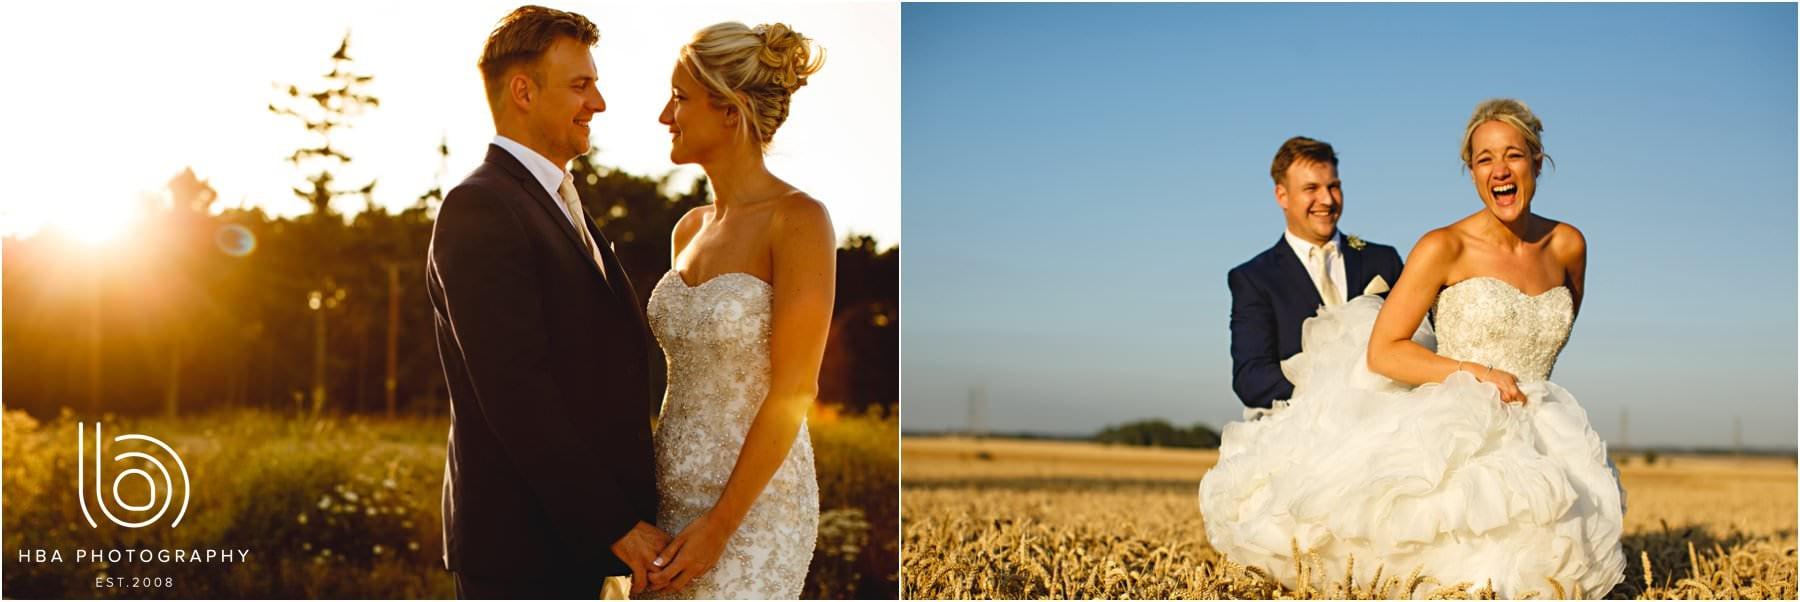 the bride & Groom in a corn field